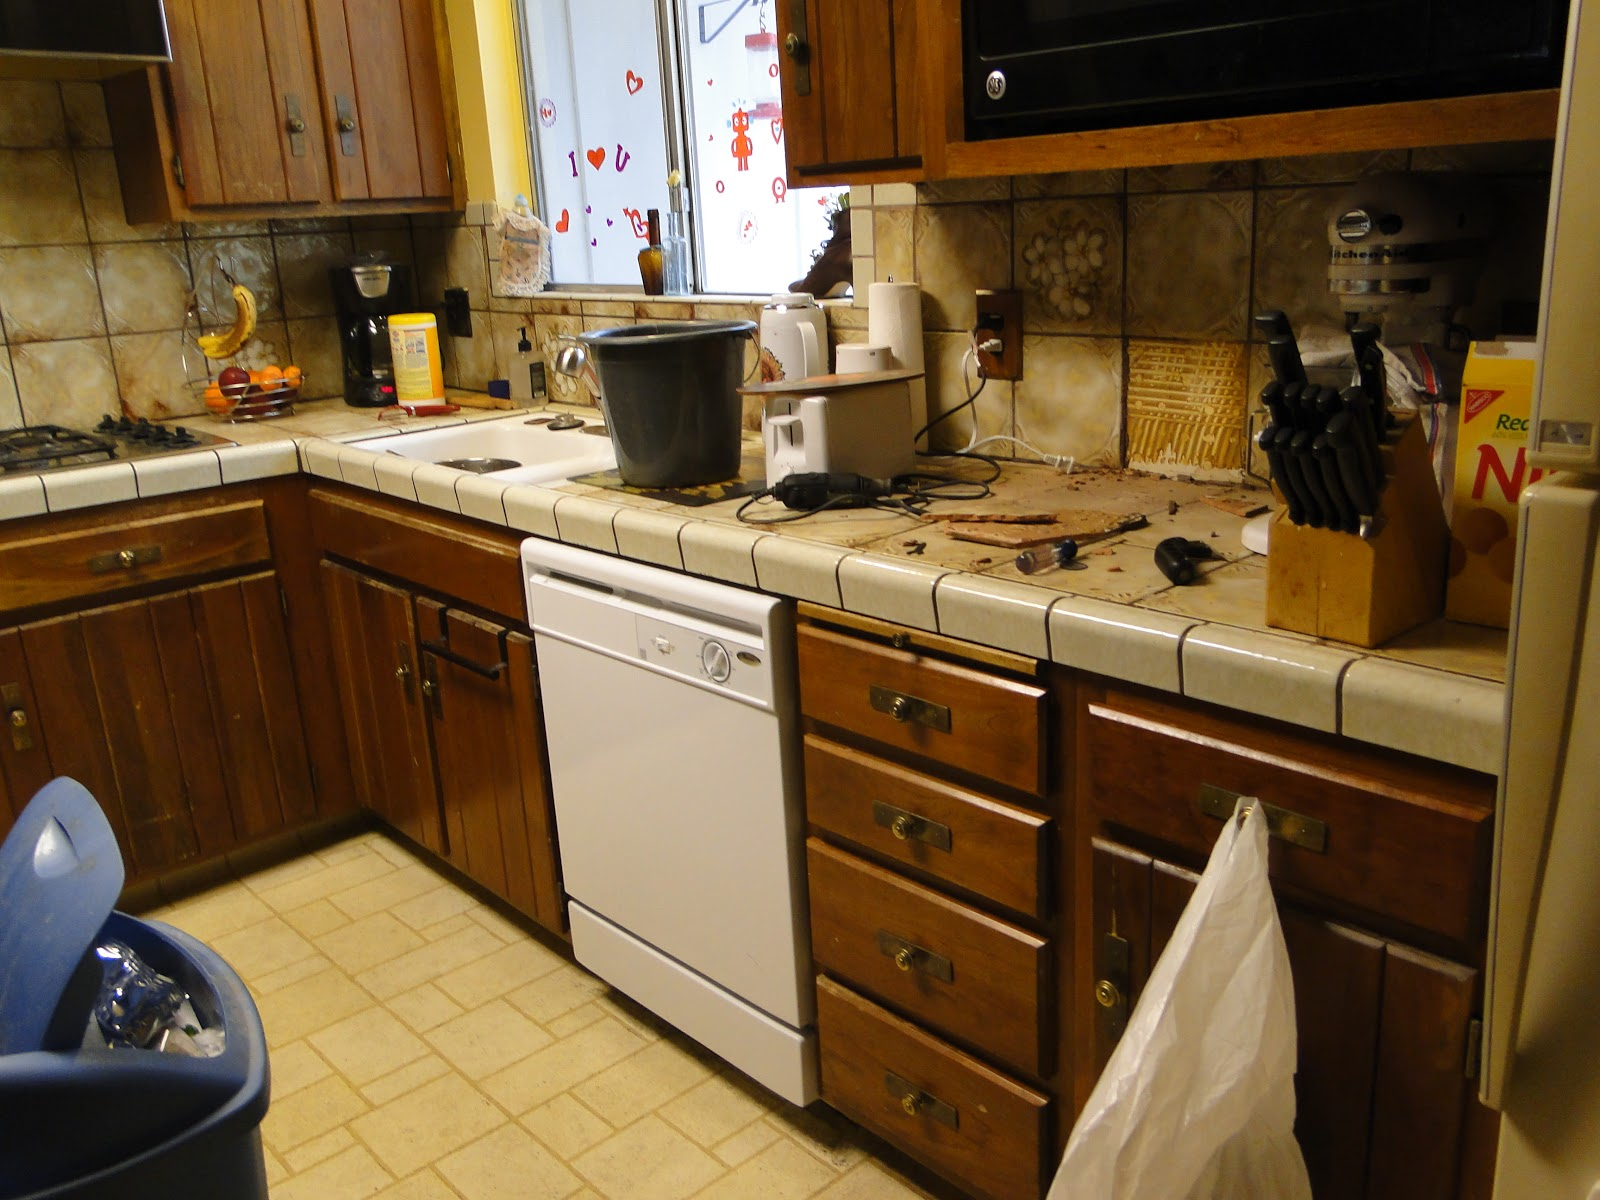 kitchen renovations on a budget carousel utensil holder not ashamed remodel shoestring